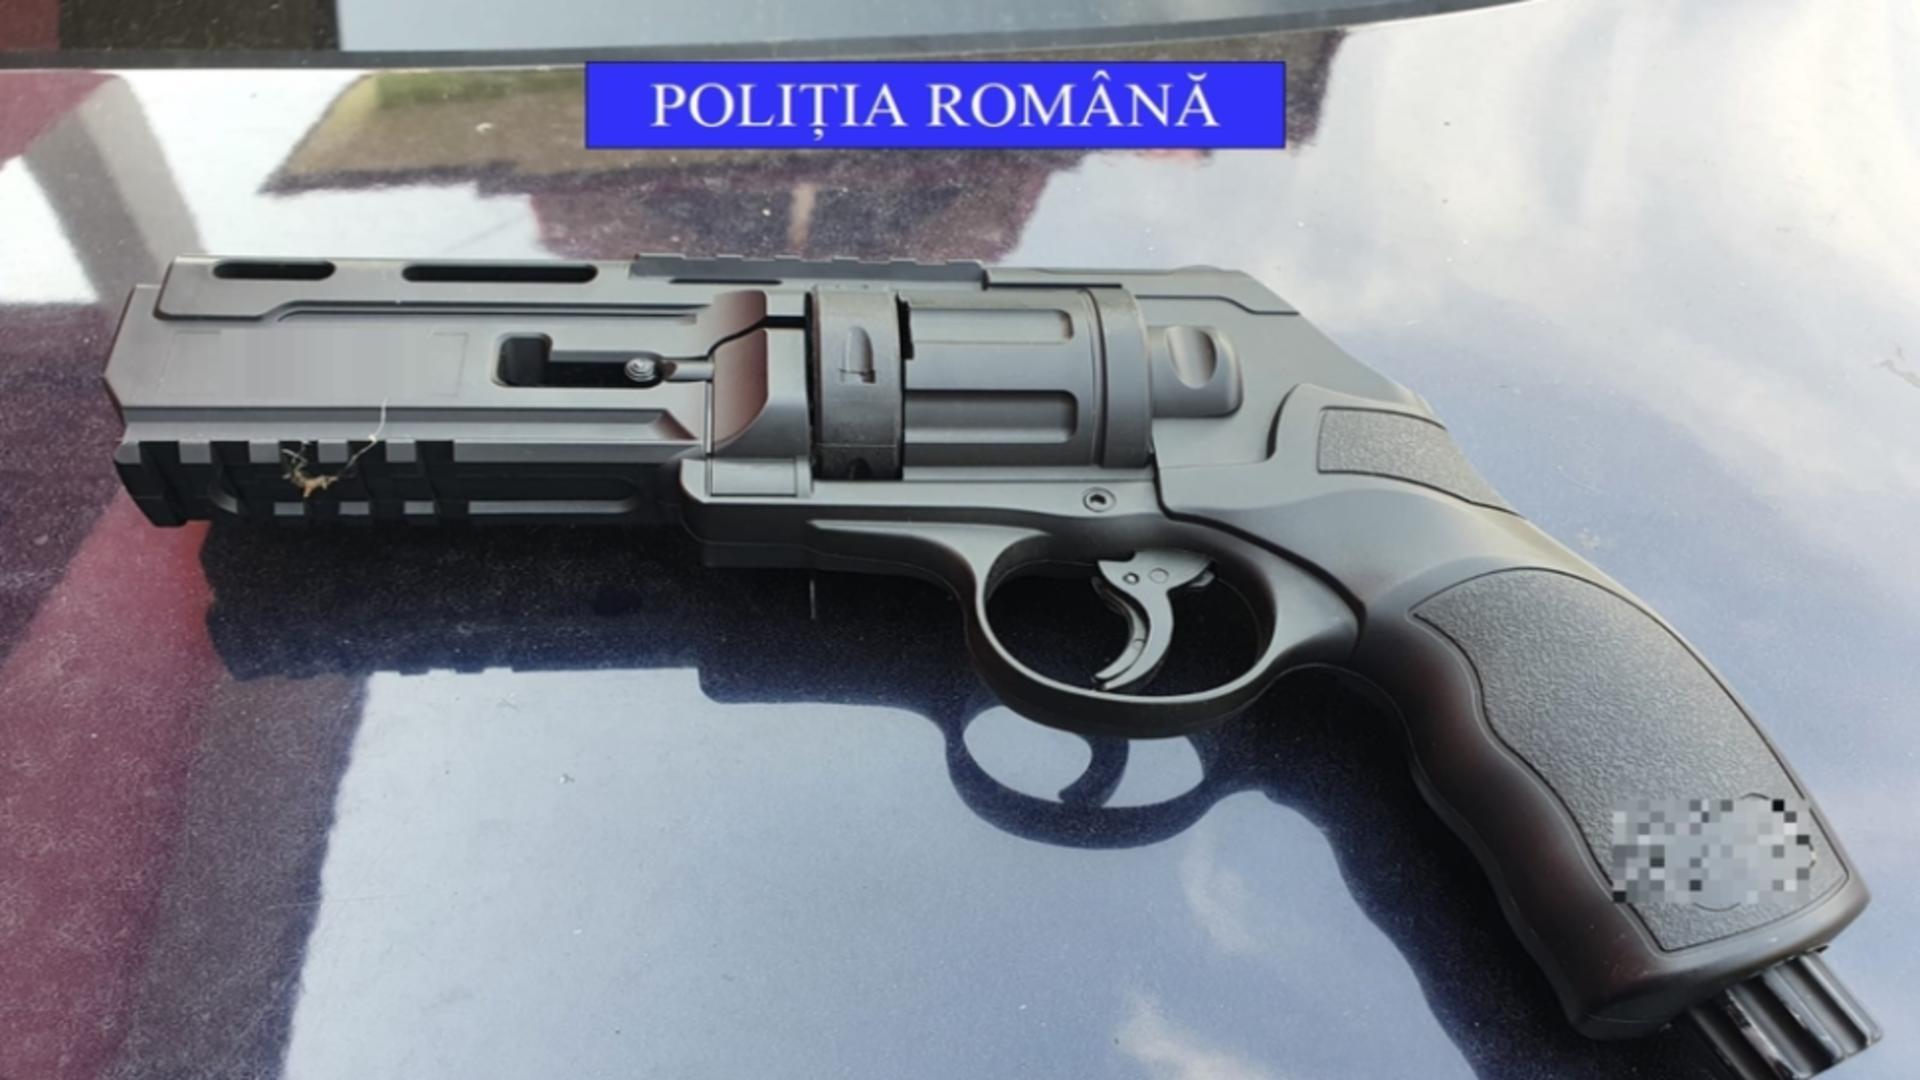 Sursa foto: Poliția Română